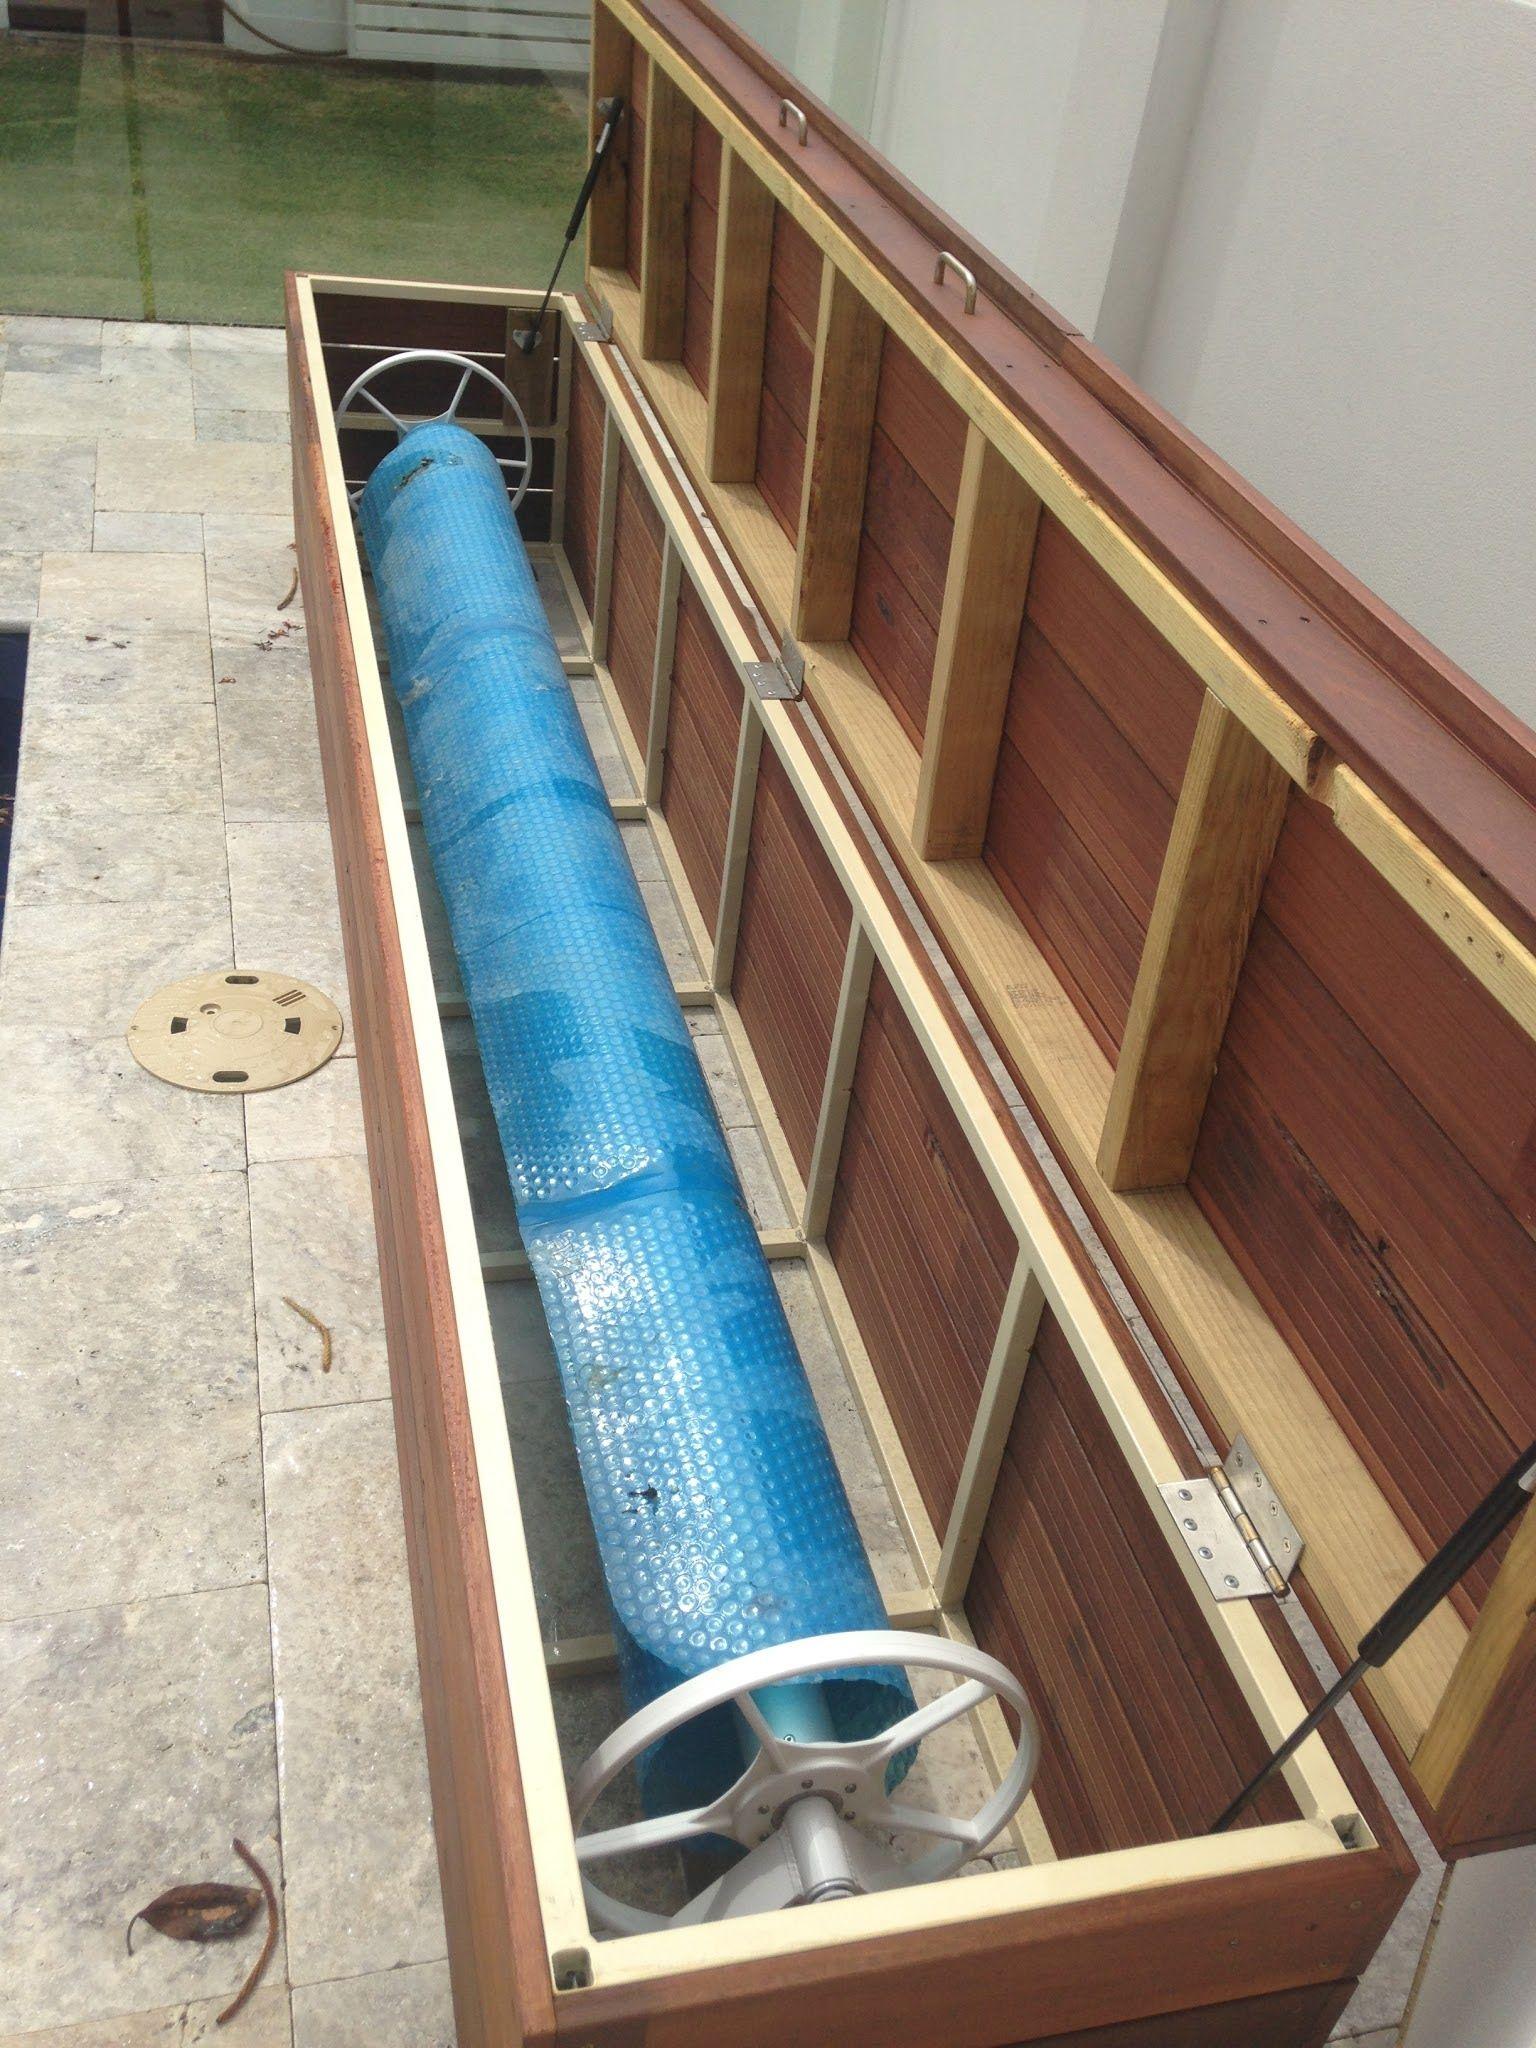 Image result for hidden pool cover reel piscinas